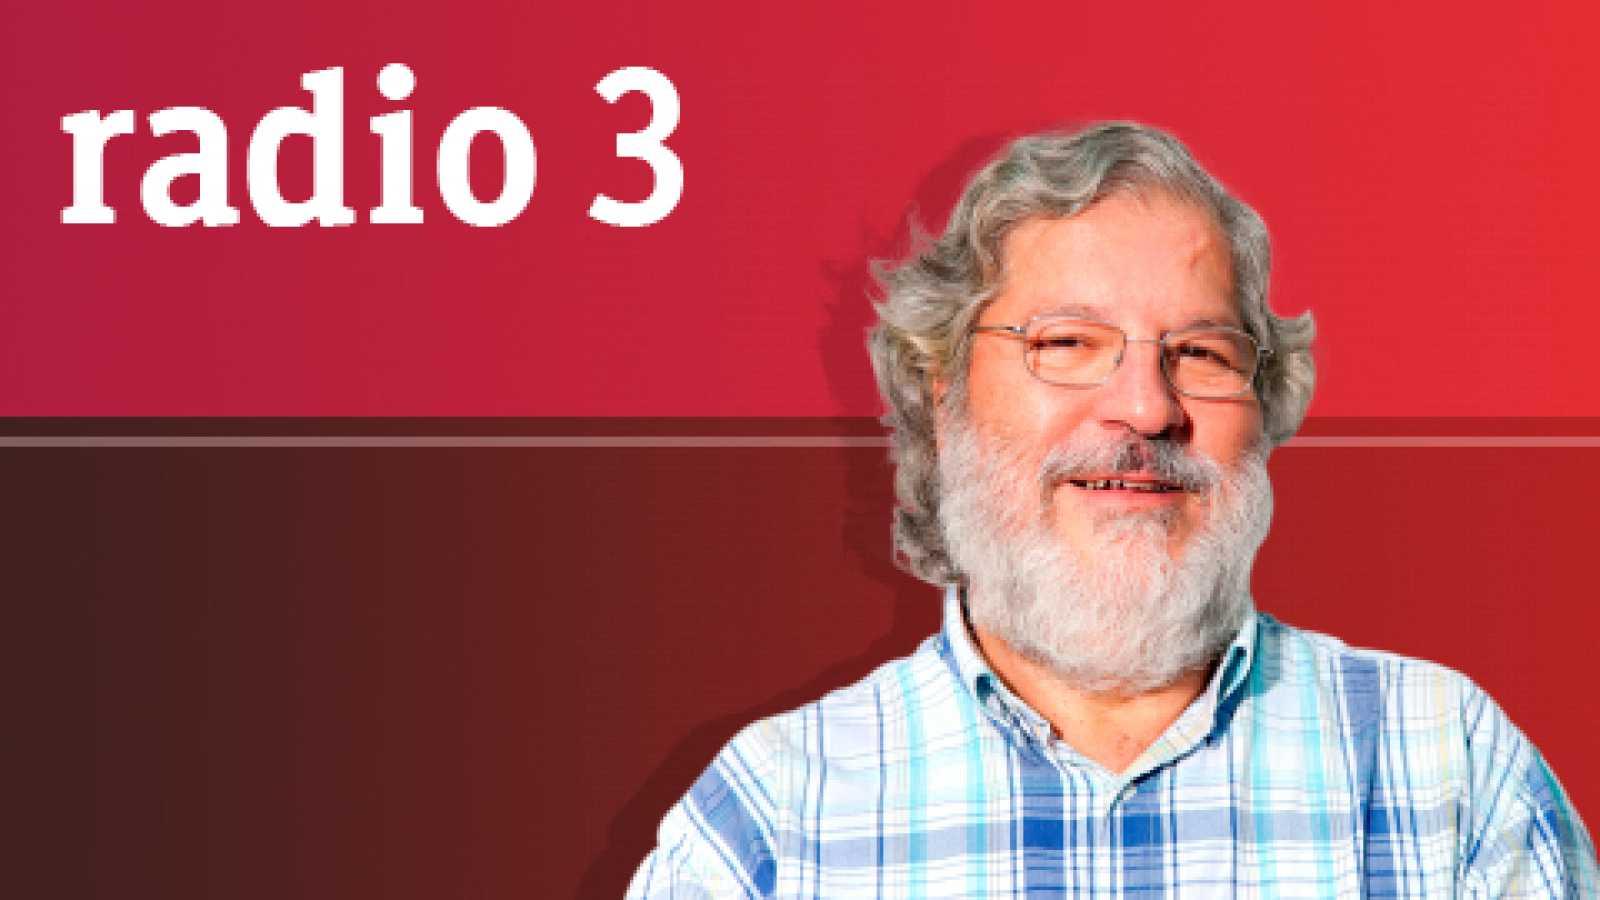 Discópolis 9691 - Mara Aranda - 21/03/17 - escuchar ahora